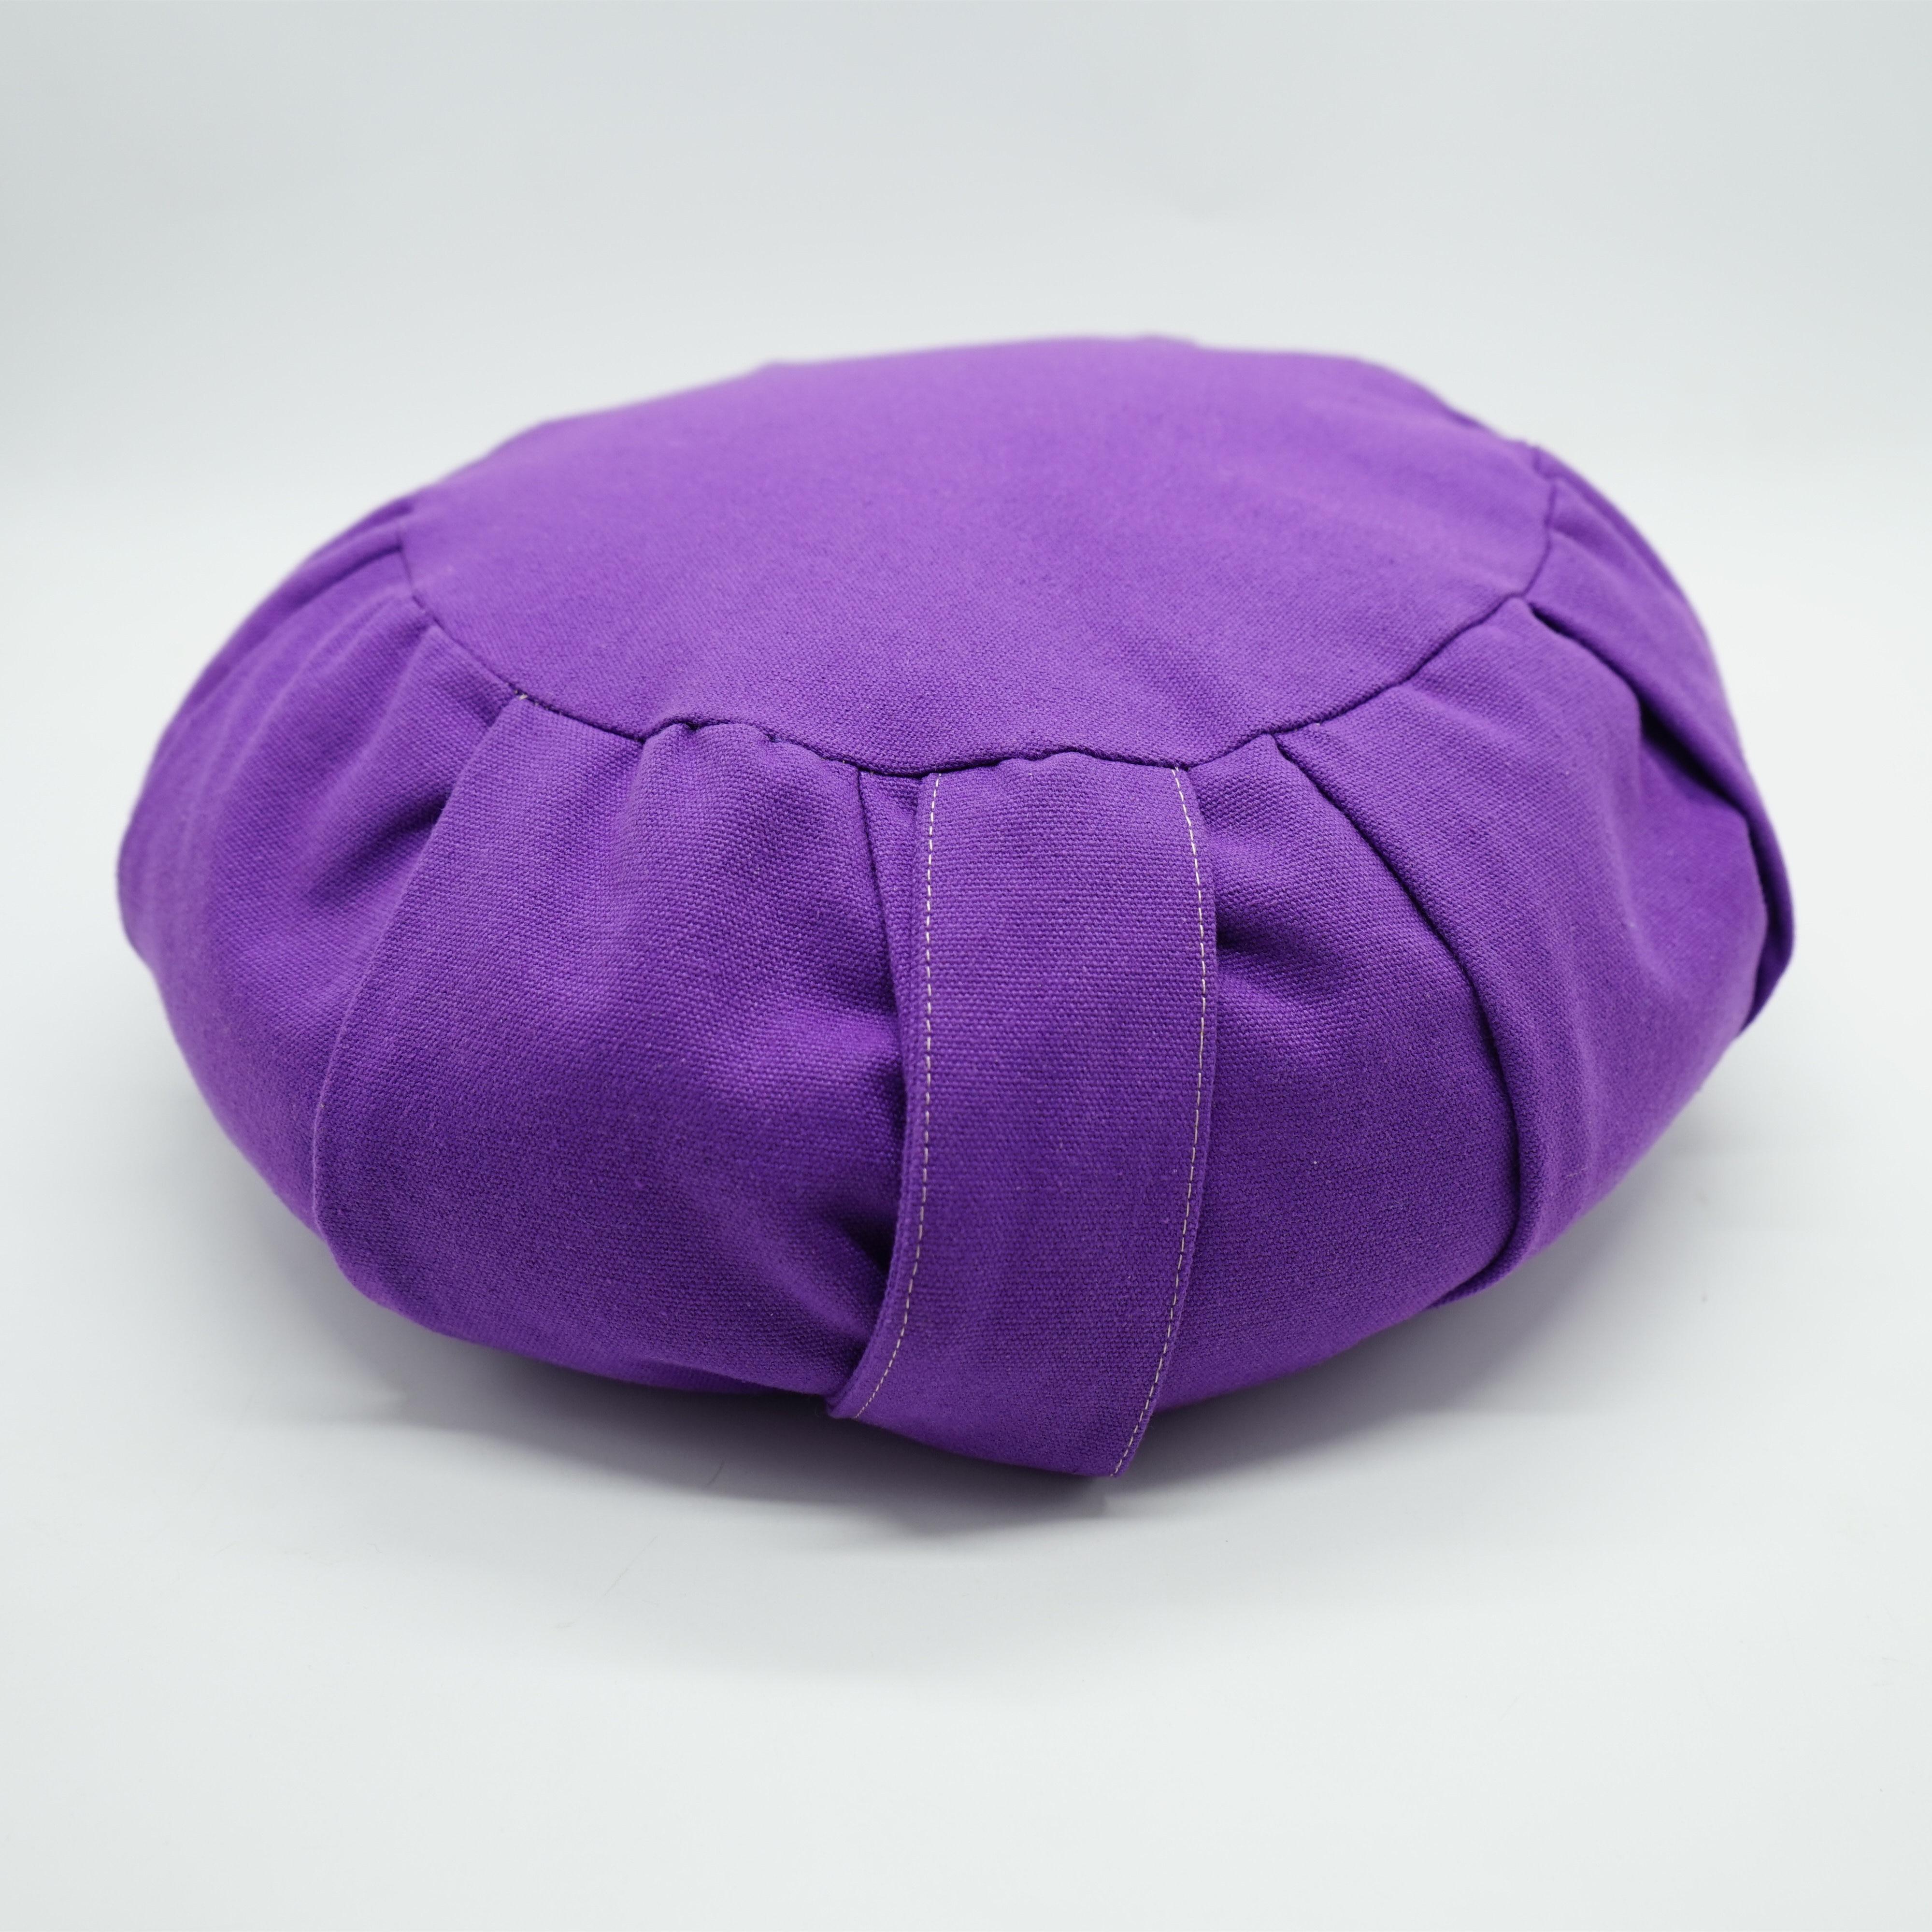 100% Cotton Buckwheat Meditation Cushion